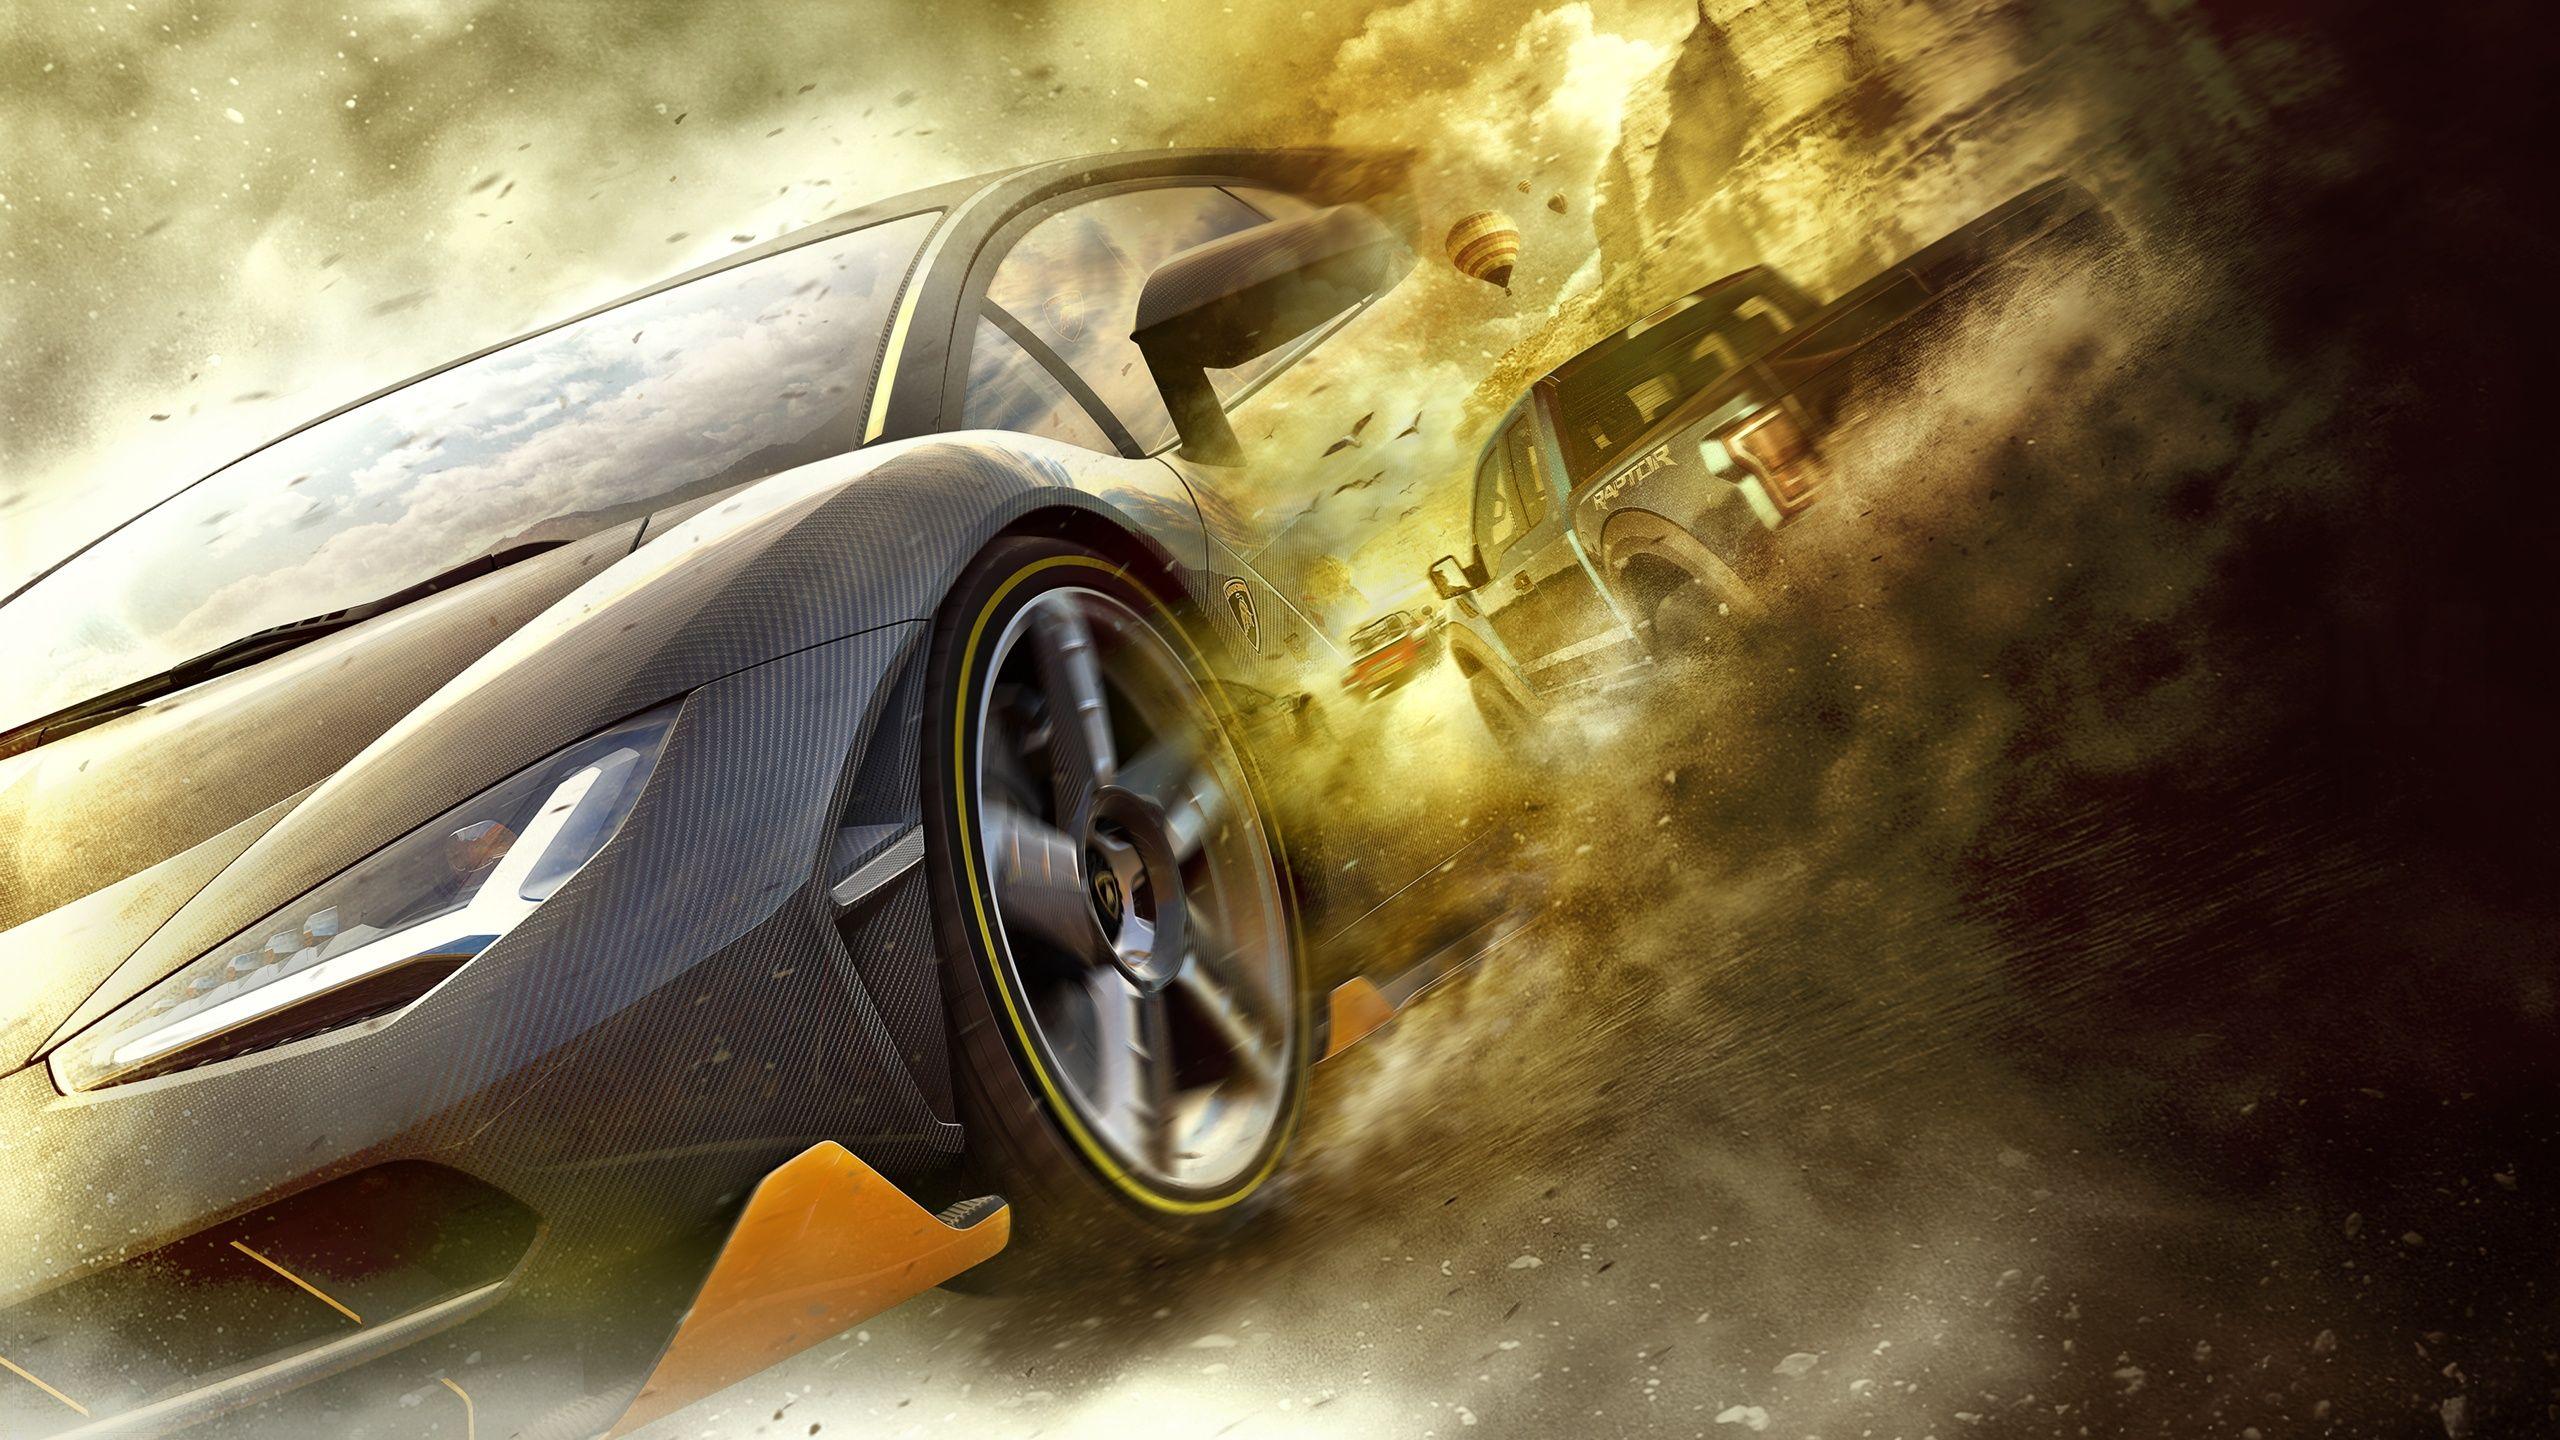 Downloadfiles Wllpapers Free Wallpaper Download Forza Horizon Forza Horizon 3 Forza